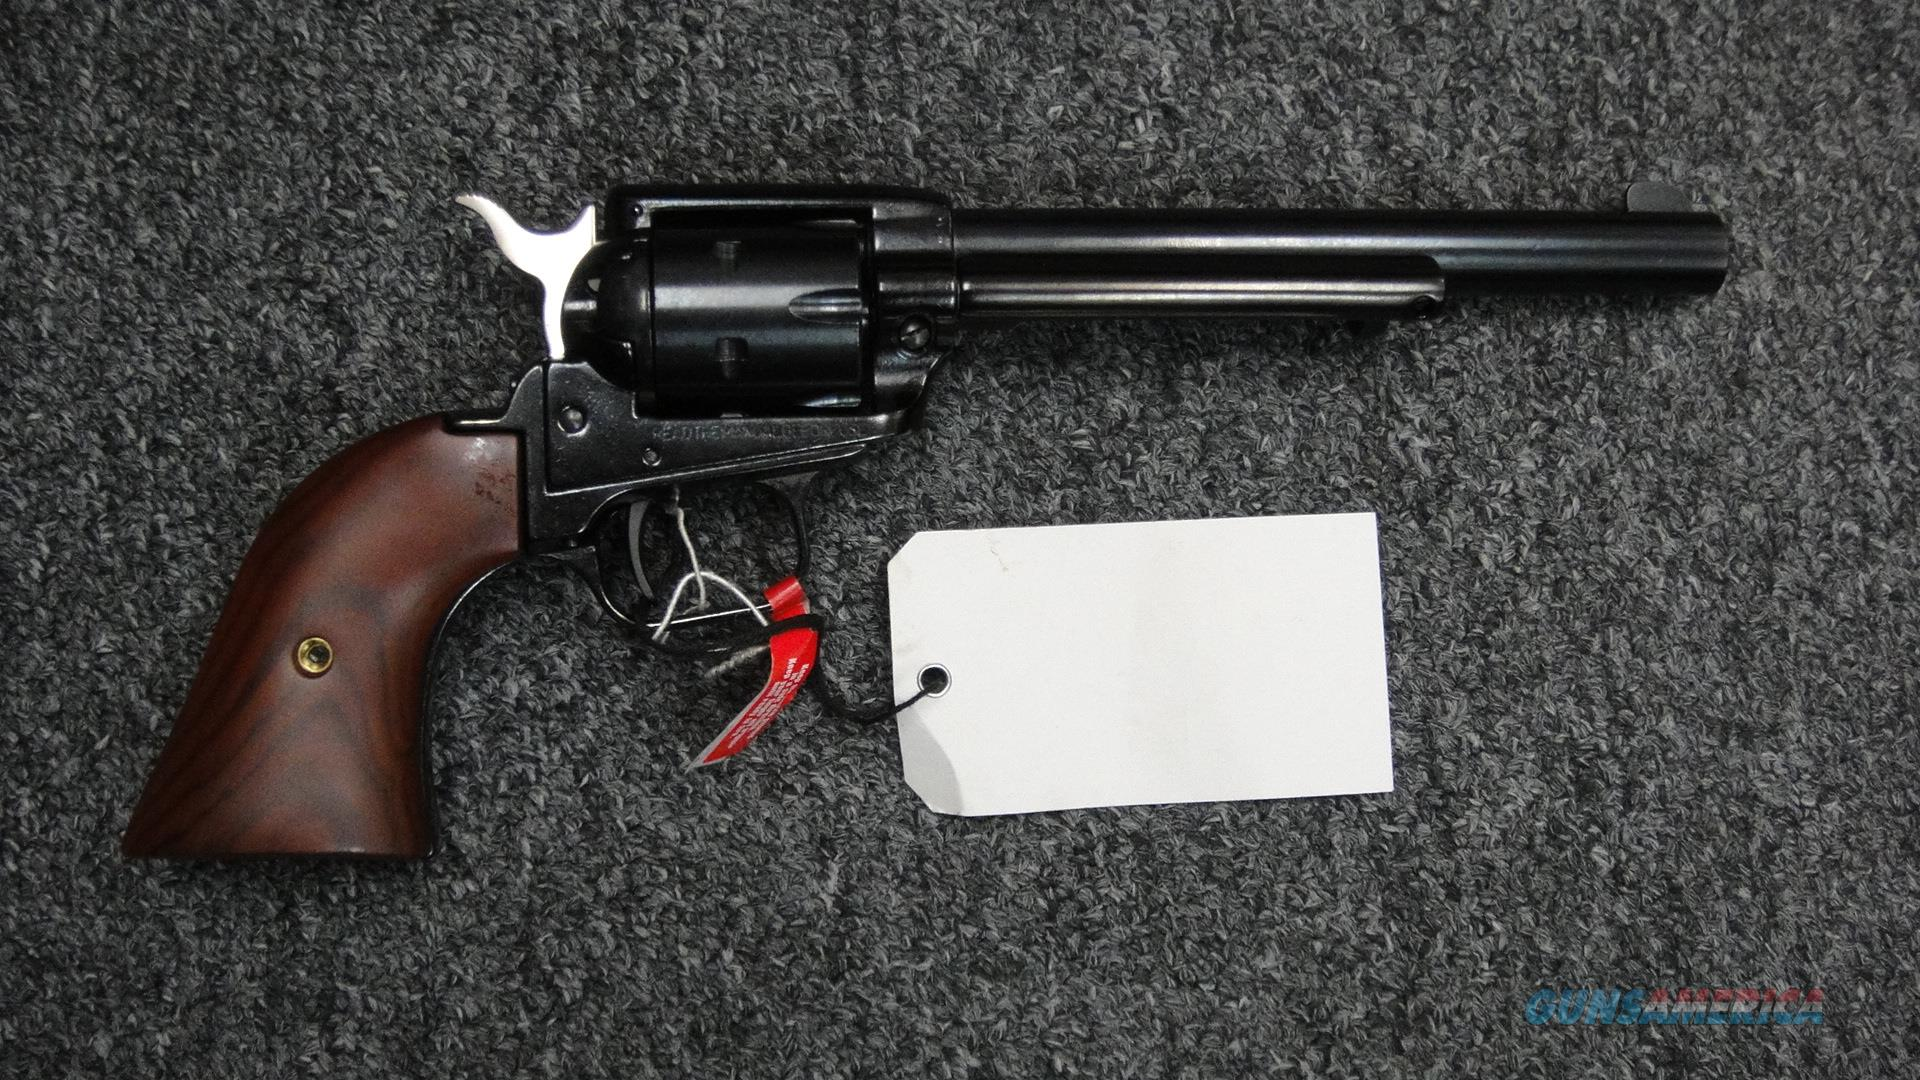 Heritage Mfg Rough Rider SAO revolver .22LR/.22 mag  Guns > Pistols > Heritage